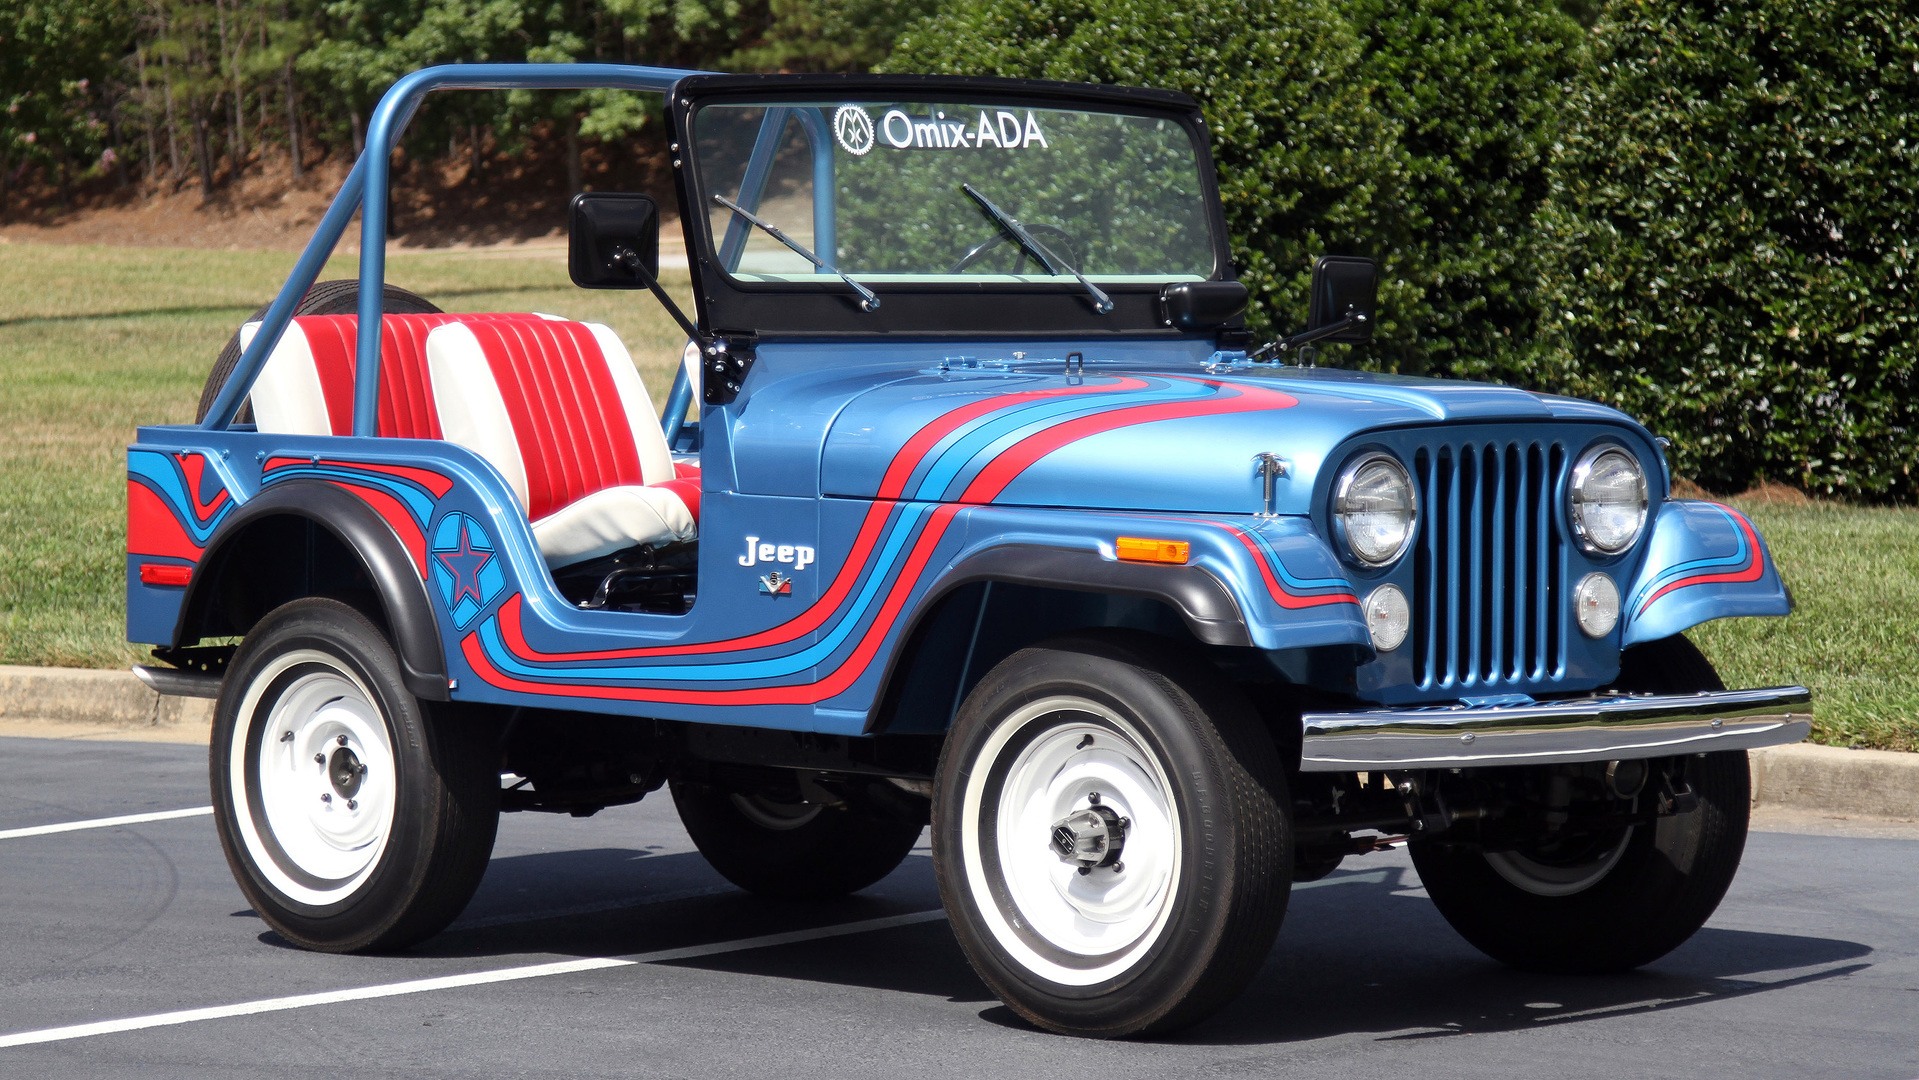 Jeep Heaven turns up in Georgia